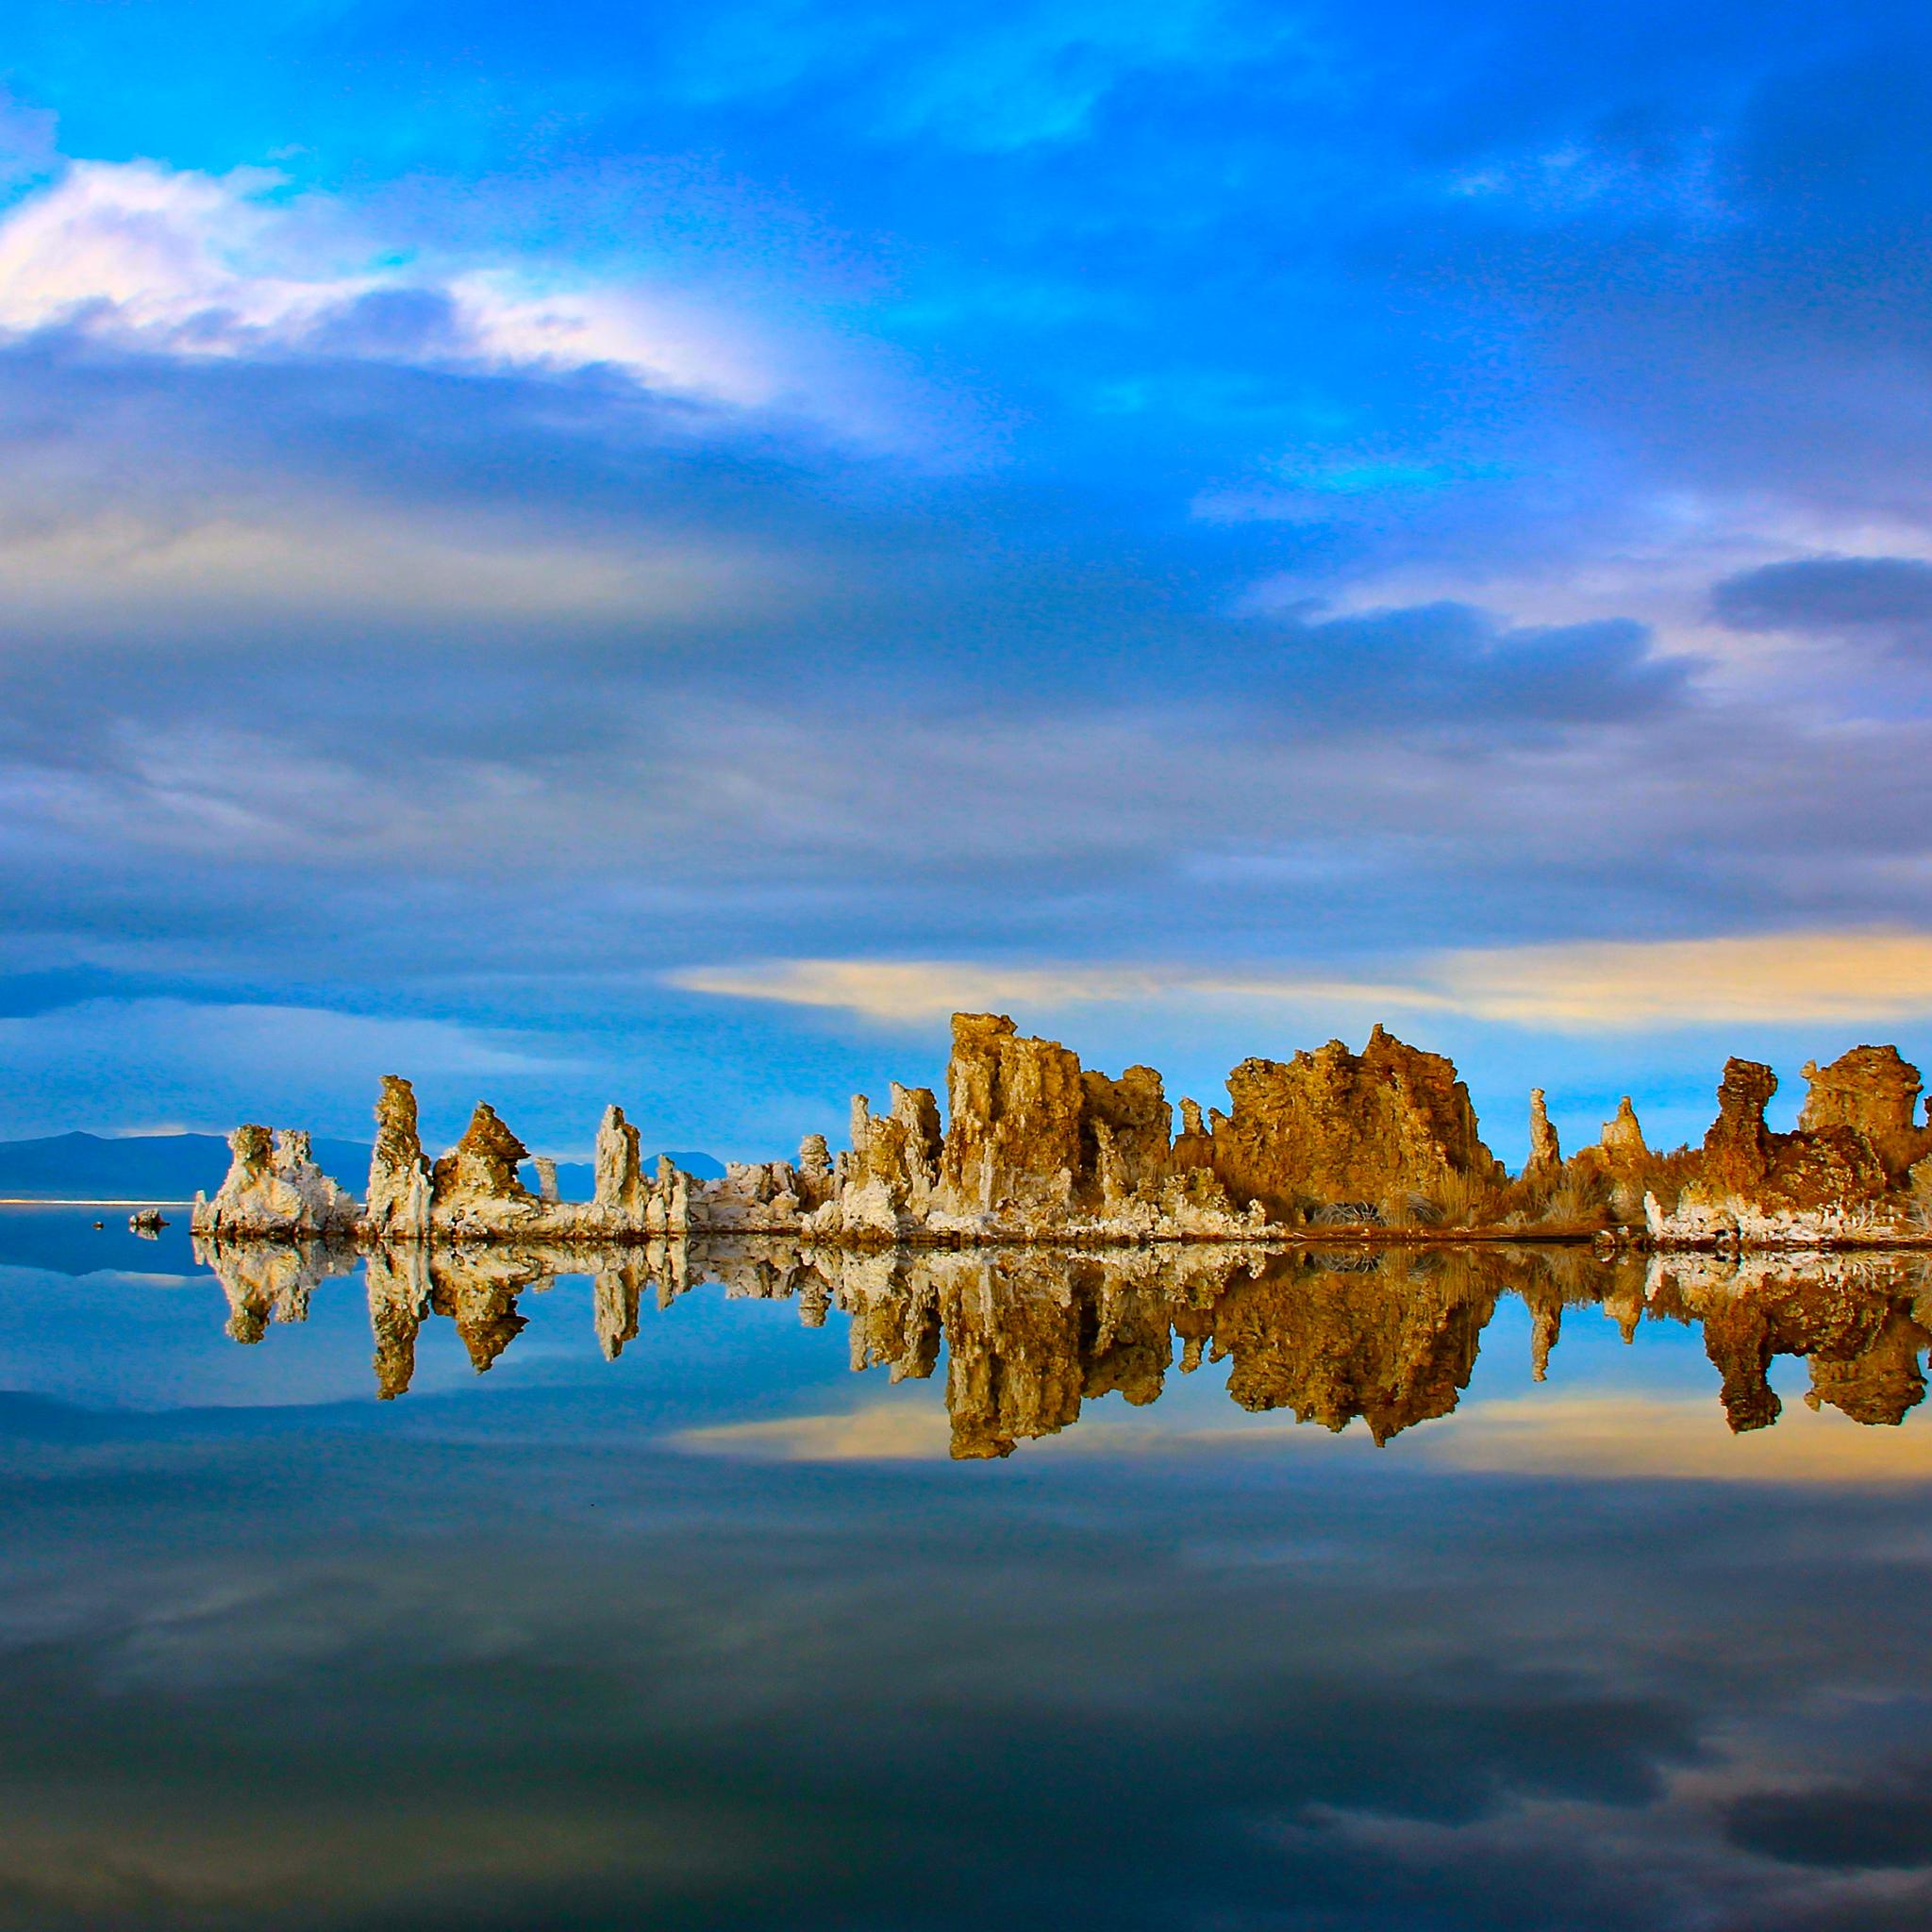 Californian Mono Lake 3Wallpapers iPad Retina Californian Mono Lake   iPad Retina